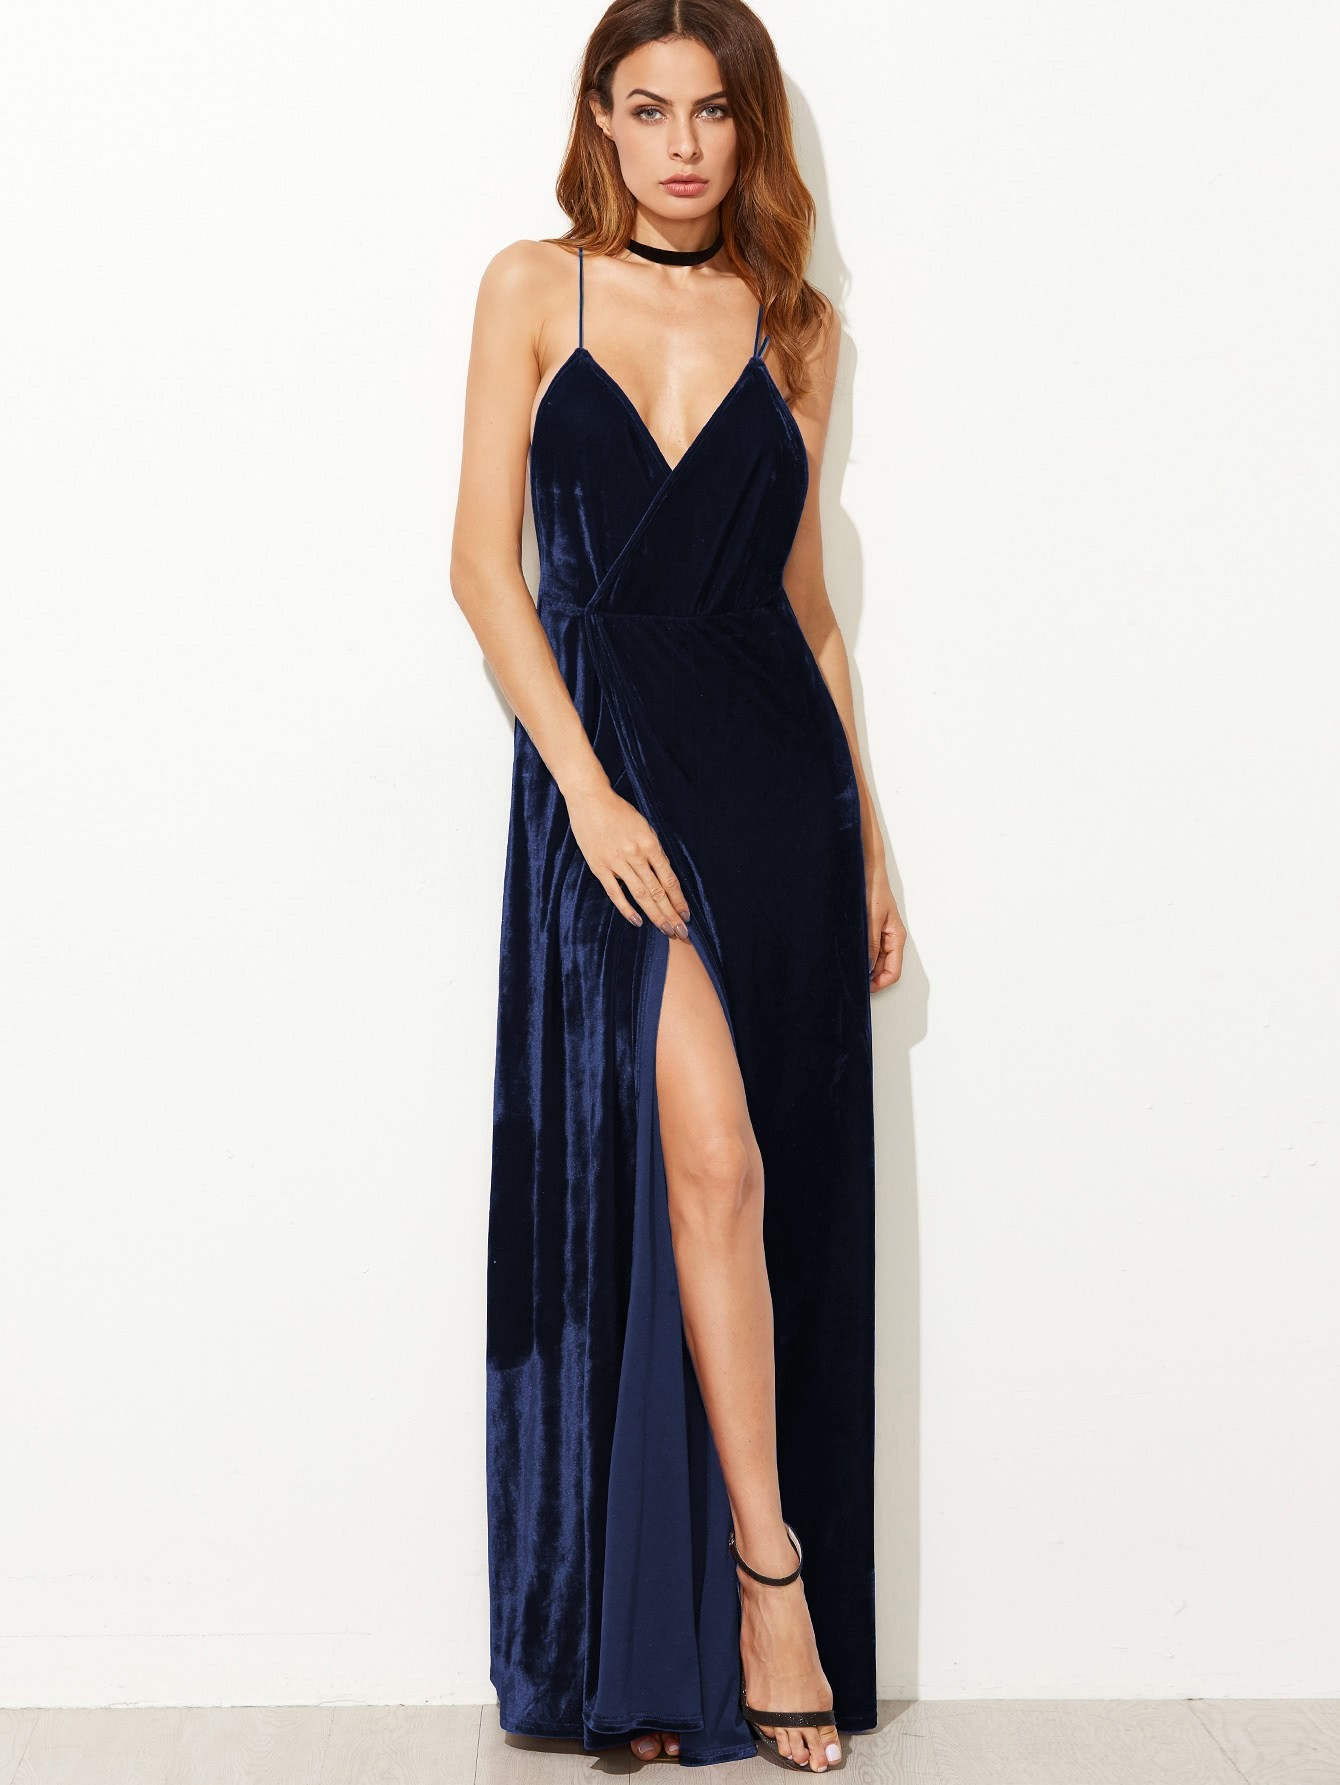 Strappy Backless Wrap Velvet Dress strappy backless club dress